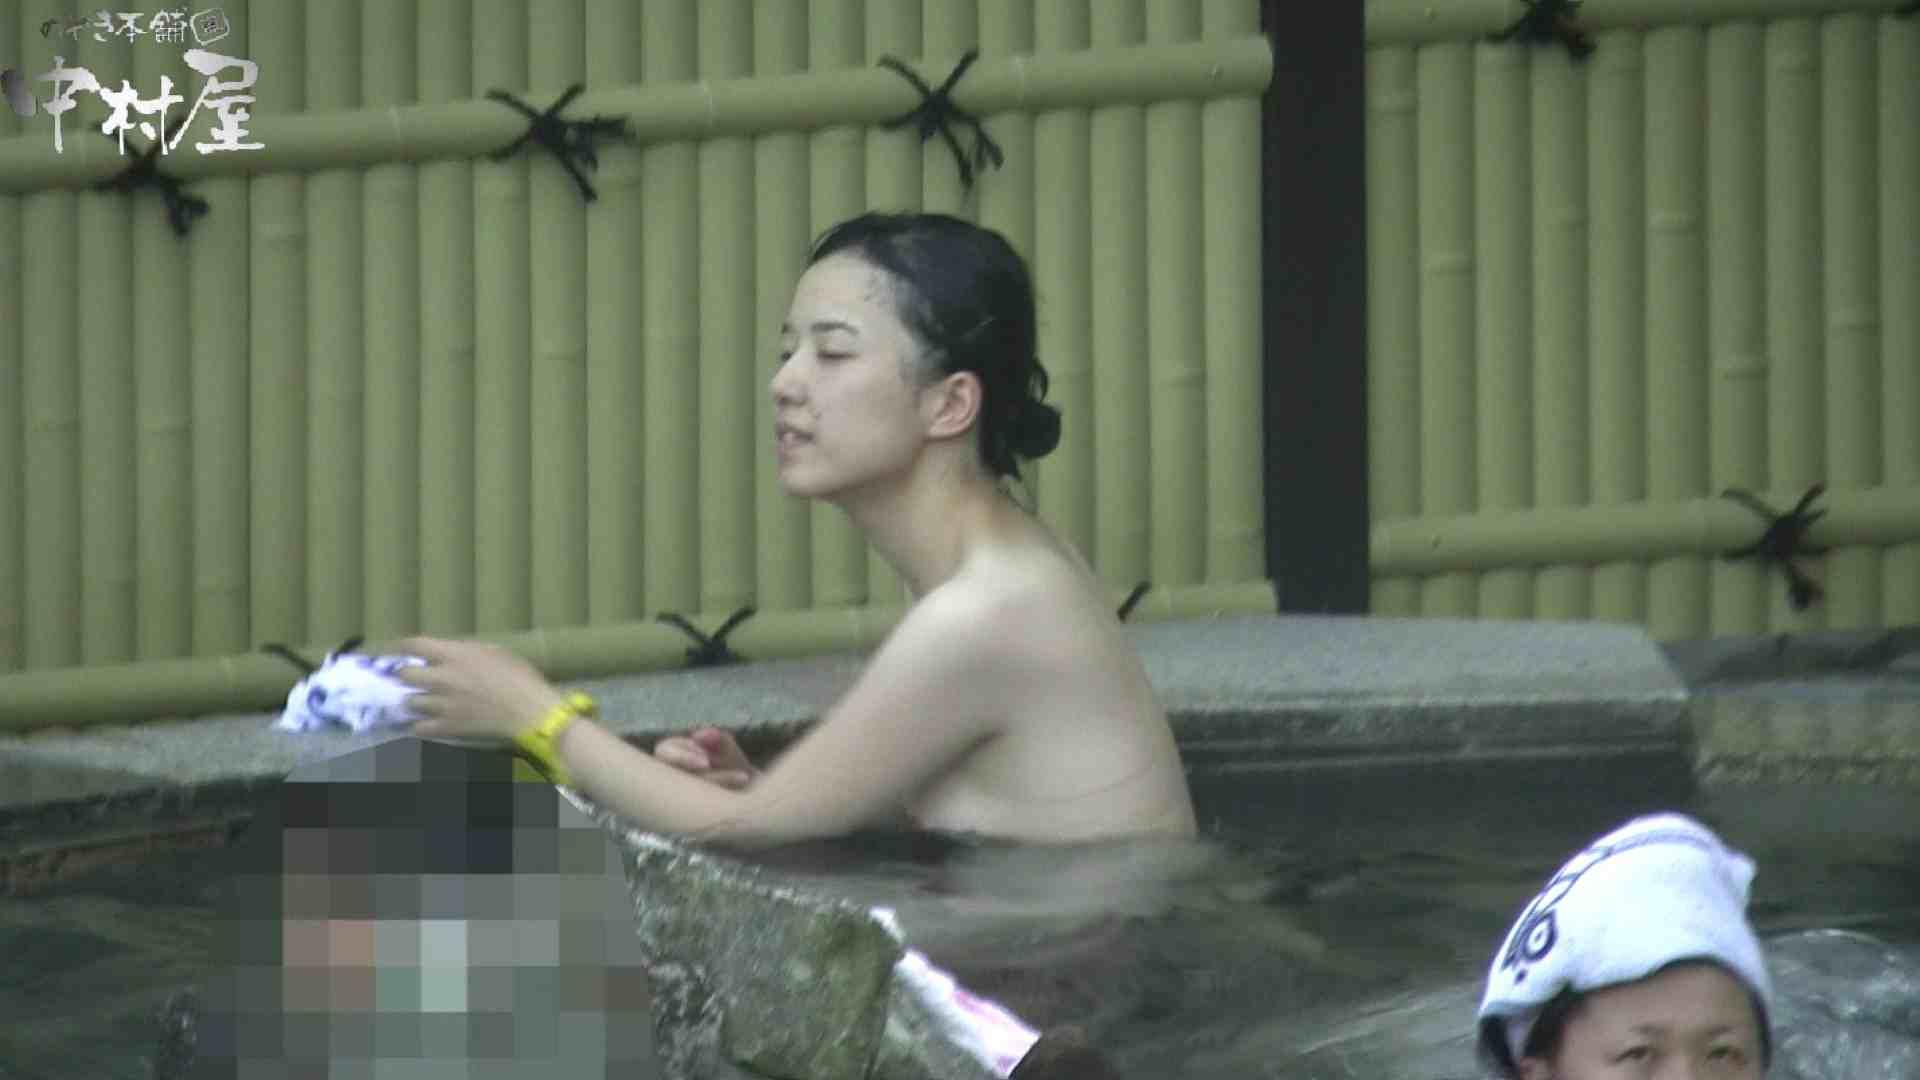 Aquaな露天風呂Vol.908 0 | 0  39連発 11